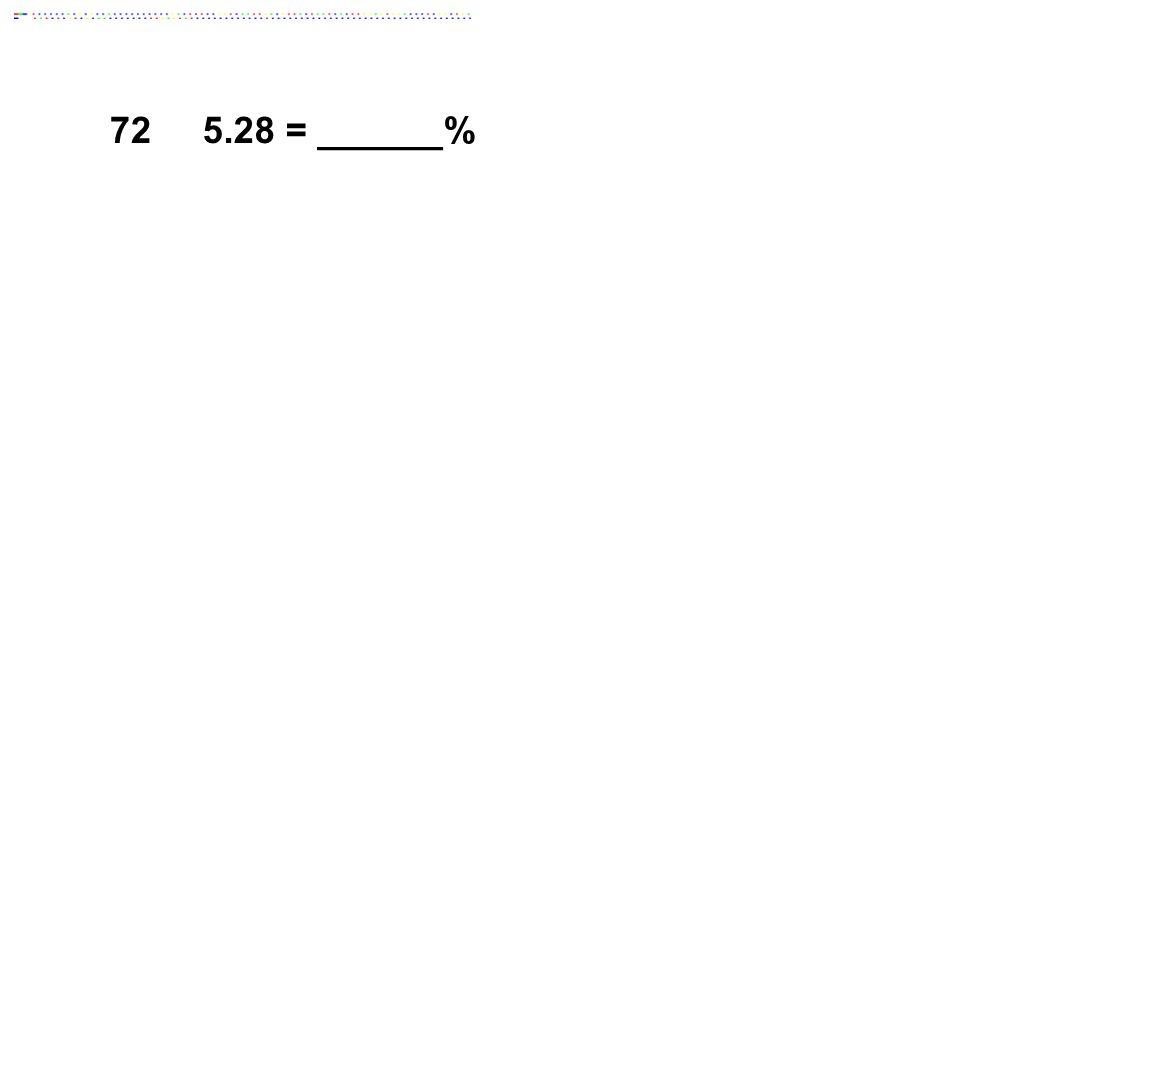 725.28 = ______%